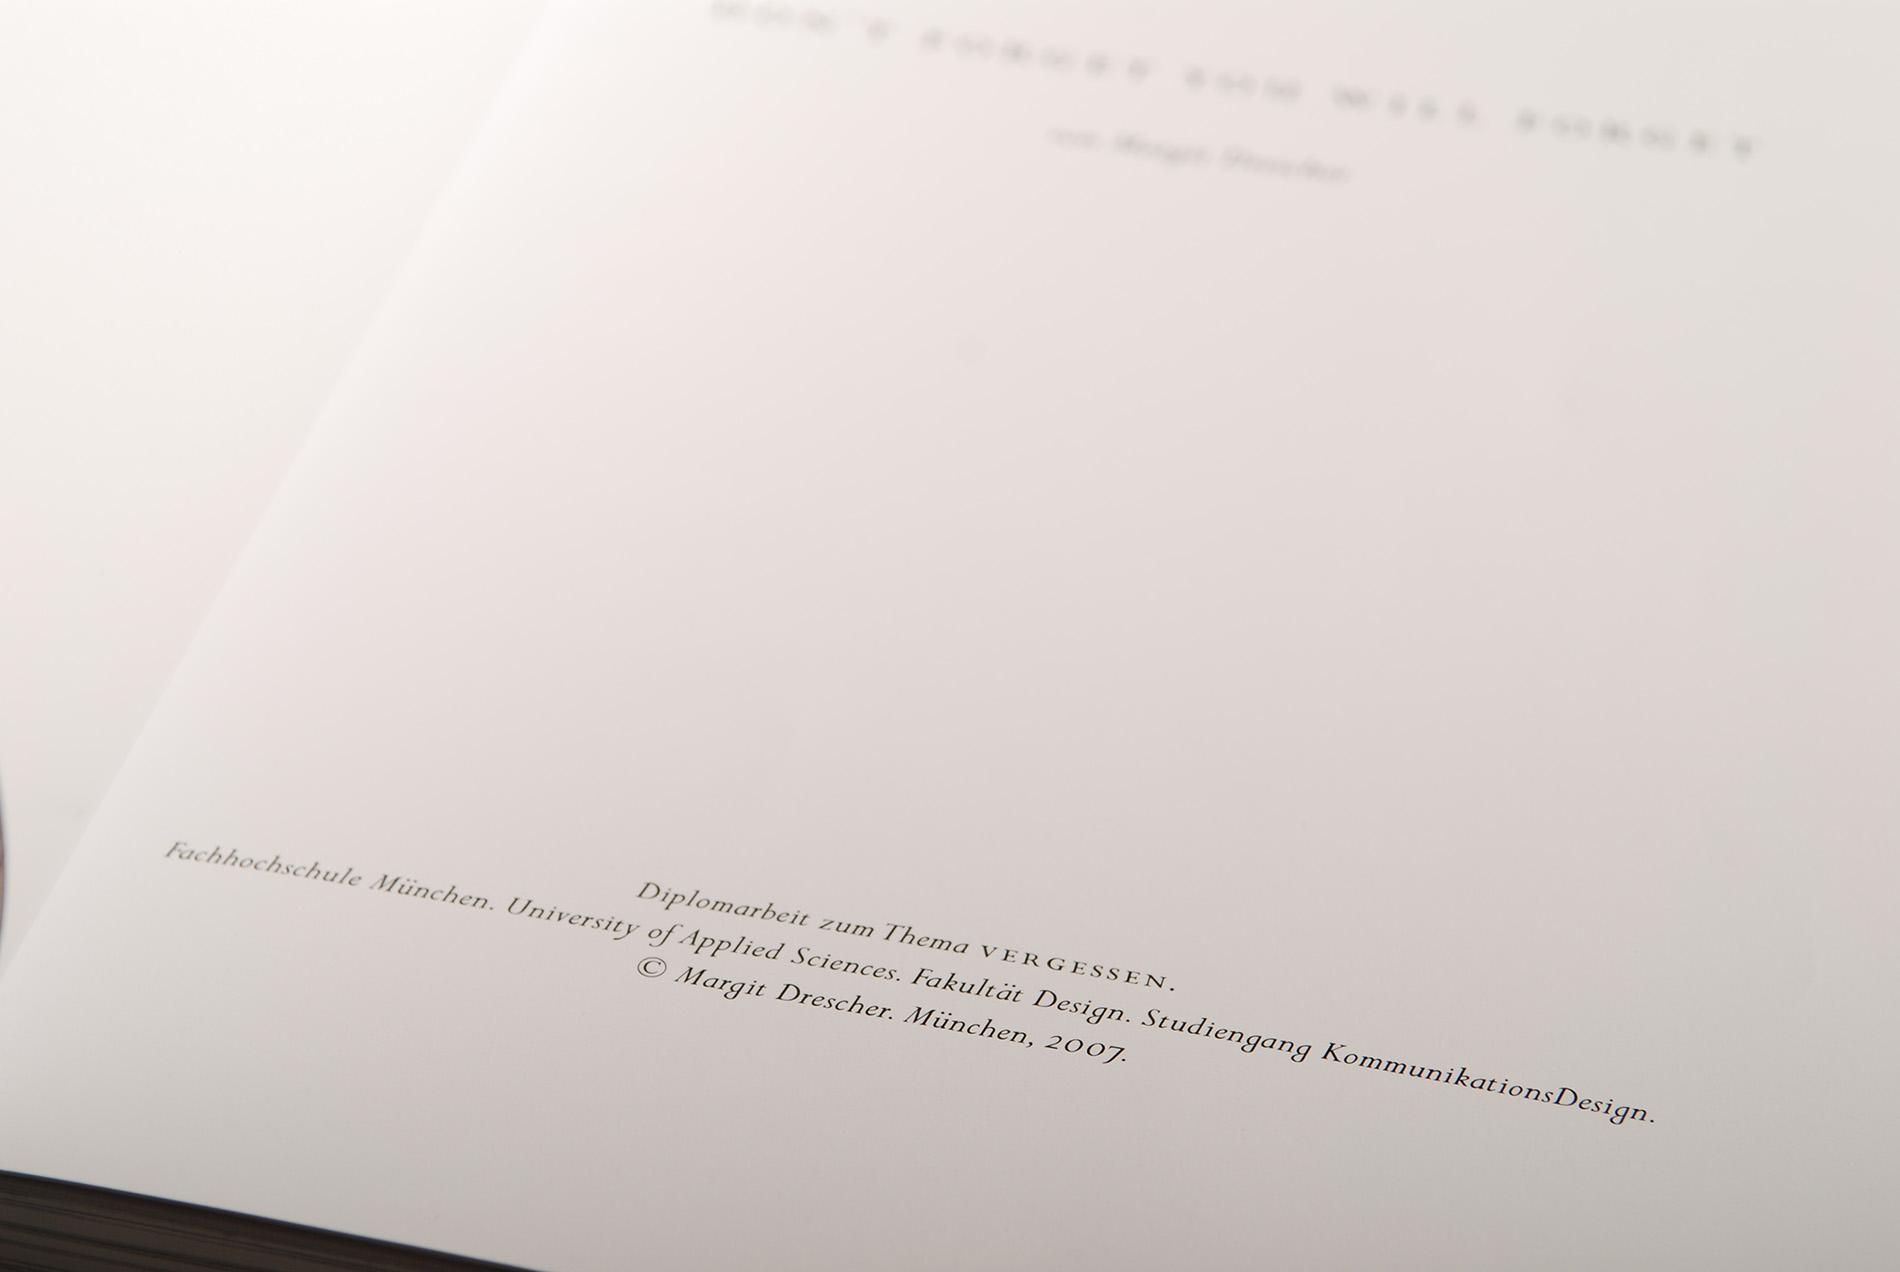 Diploma Thesis by Margit Drescher